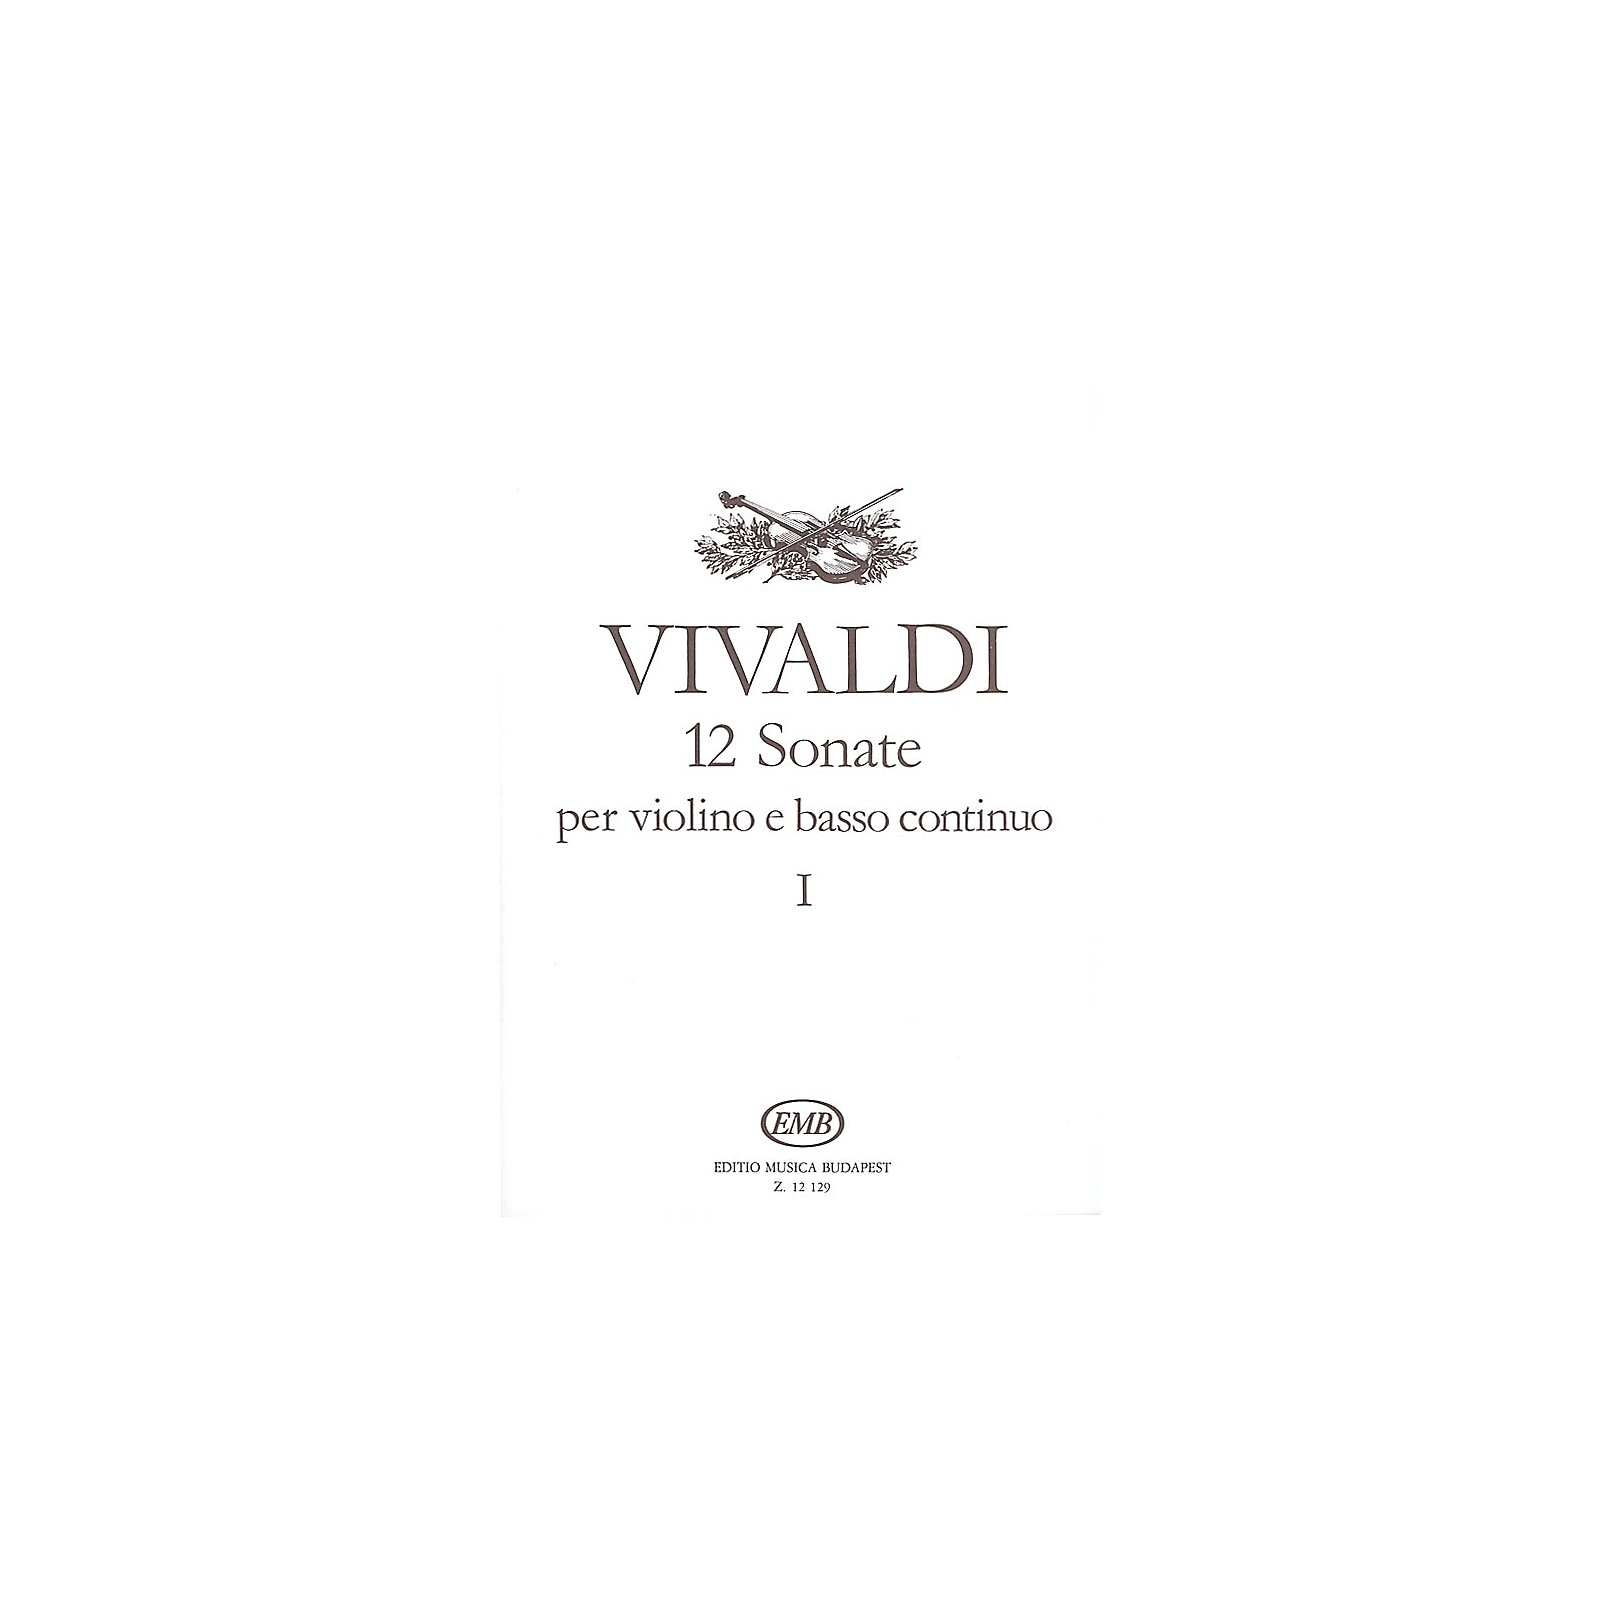 Editio Musica Budapest 12 Sonatas for Violin and Basso Continuo - Volume 1 EMB Series by Antonio Vivaldi